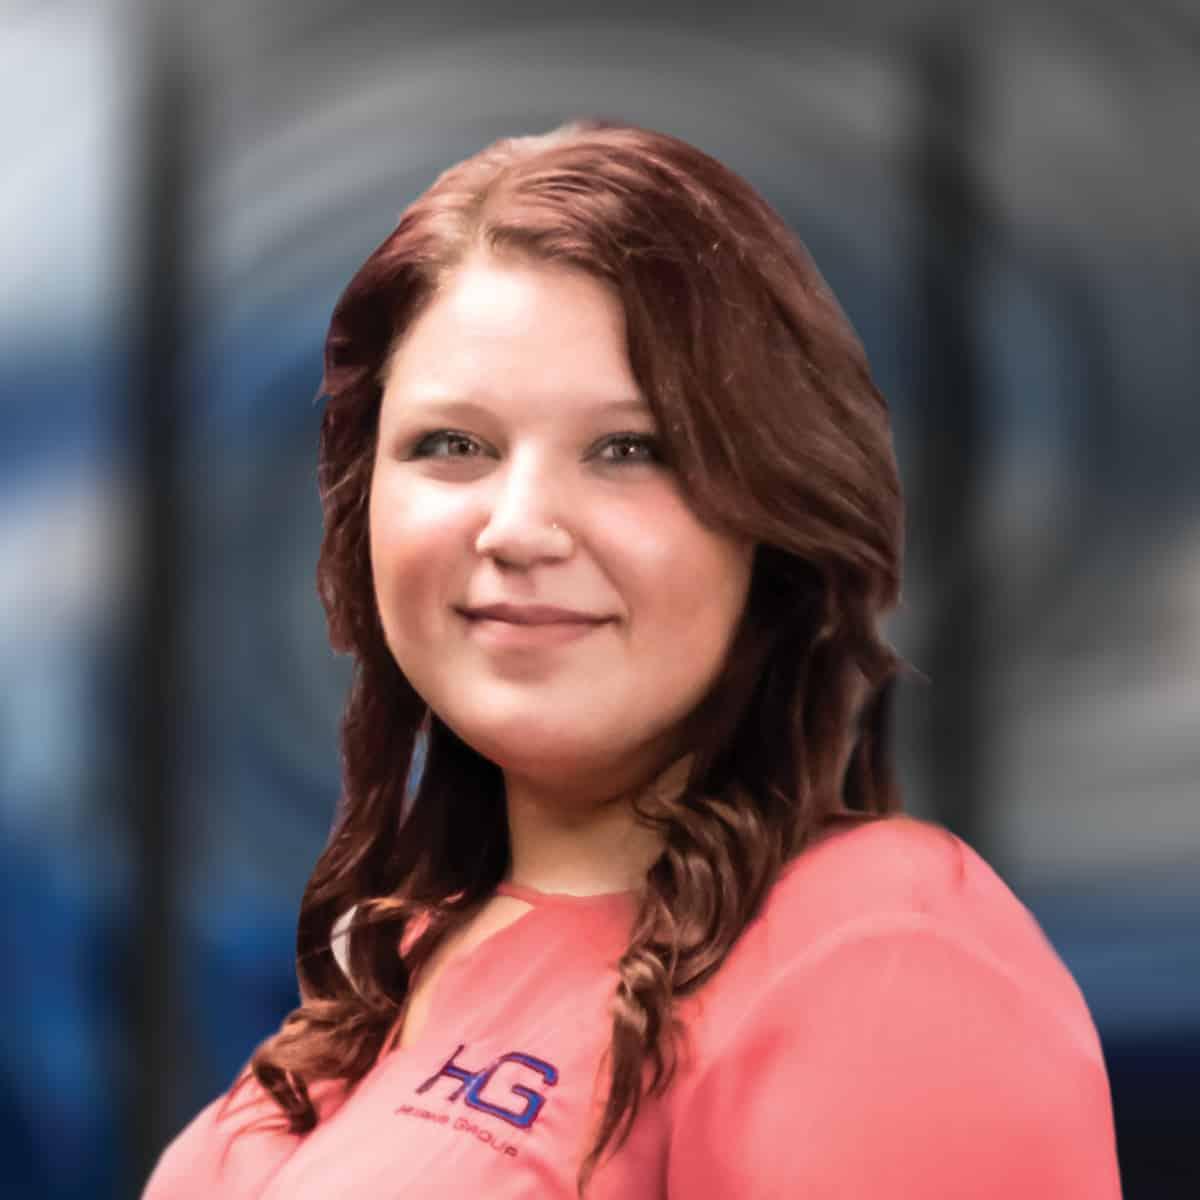 Desiree Stevens of Hearing Group in Stillwater, OK